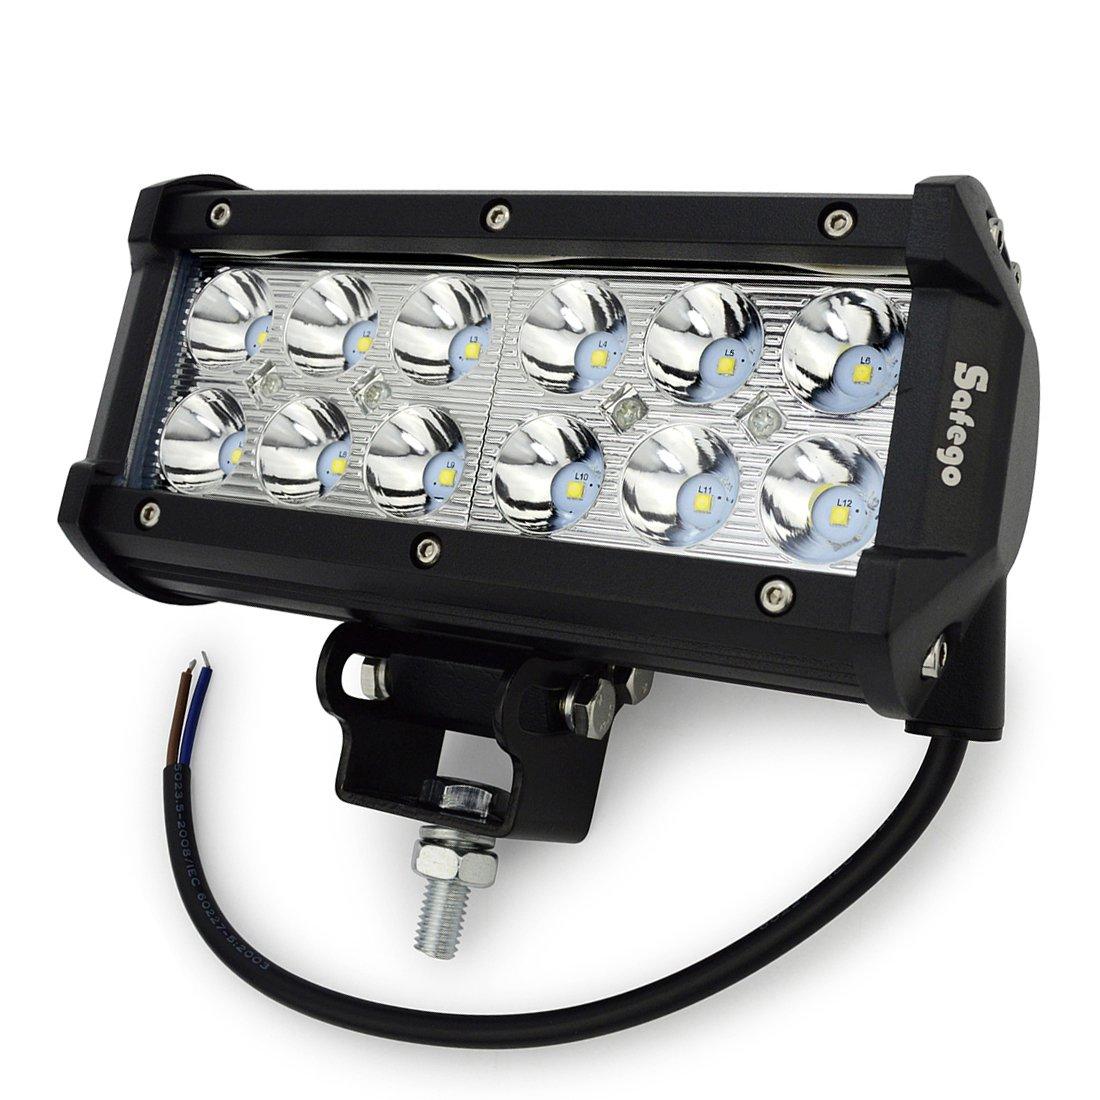 Safego 4 60W LED Arbeitsscheinwerfer Zusatzscheinwerfer 4800LM LED Auto Scheinwerfer Arbeitslicht Offroad SUV ATV 12V 24V IP68 Wasserdicht Car LED Work Light Spotlight 1 Jahr Garantie